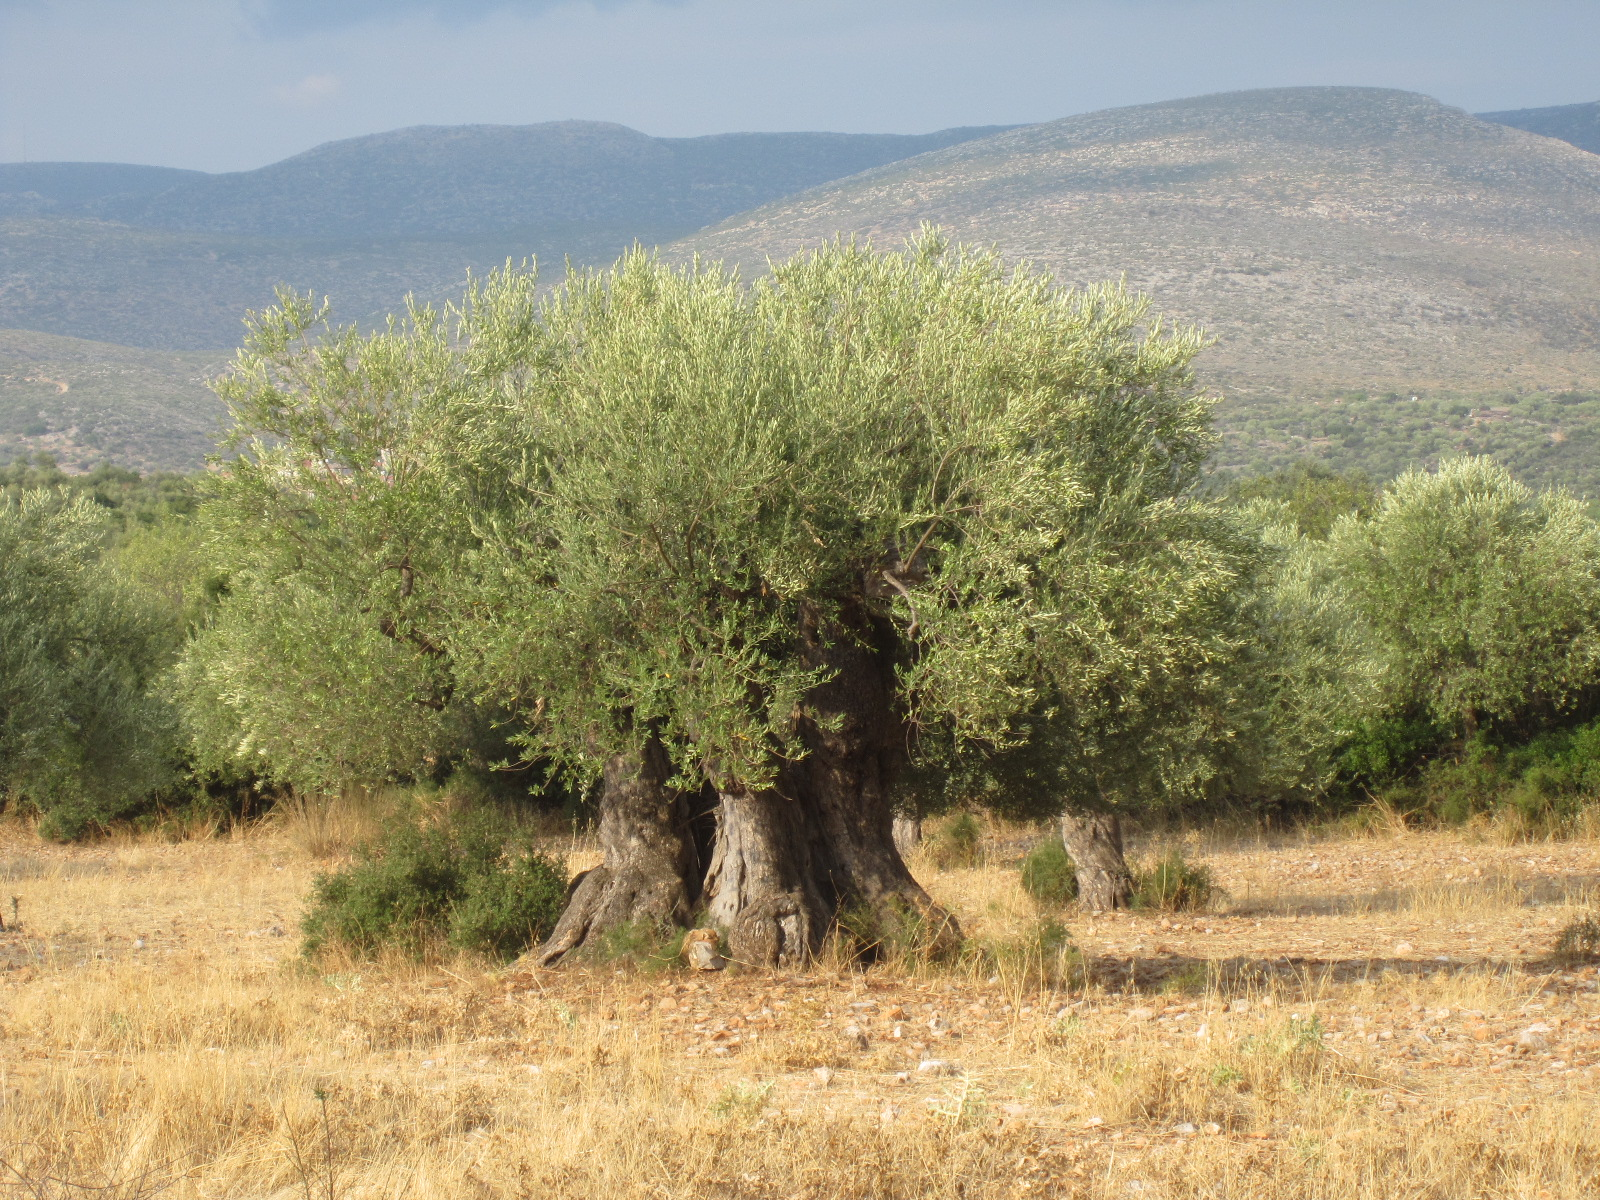 A Kouzini tree dating back over a thousand years!